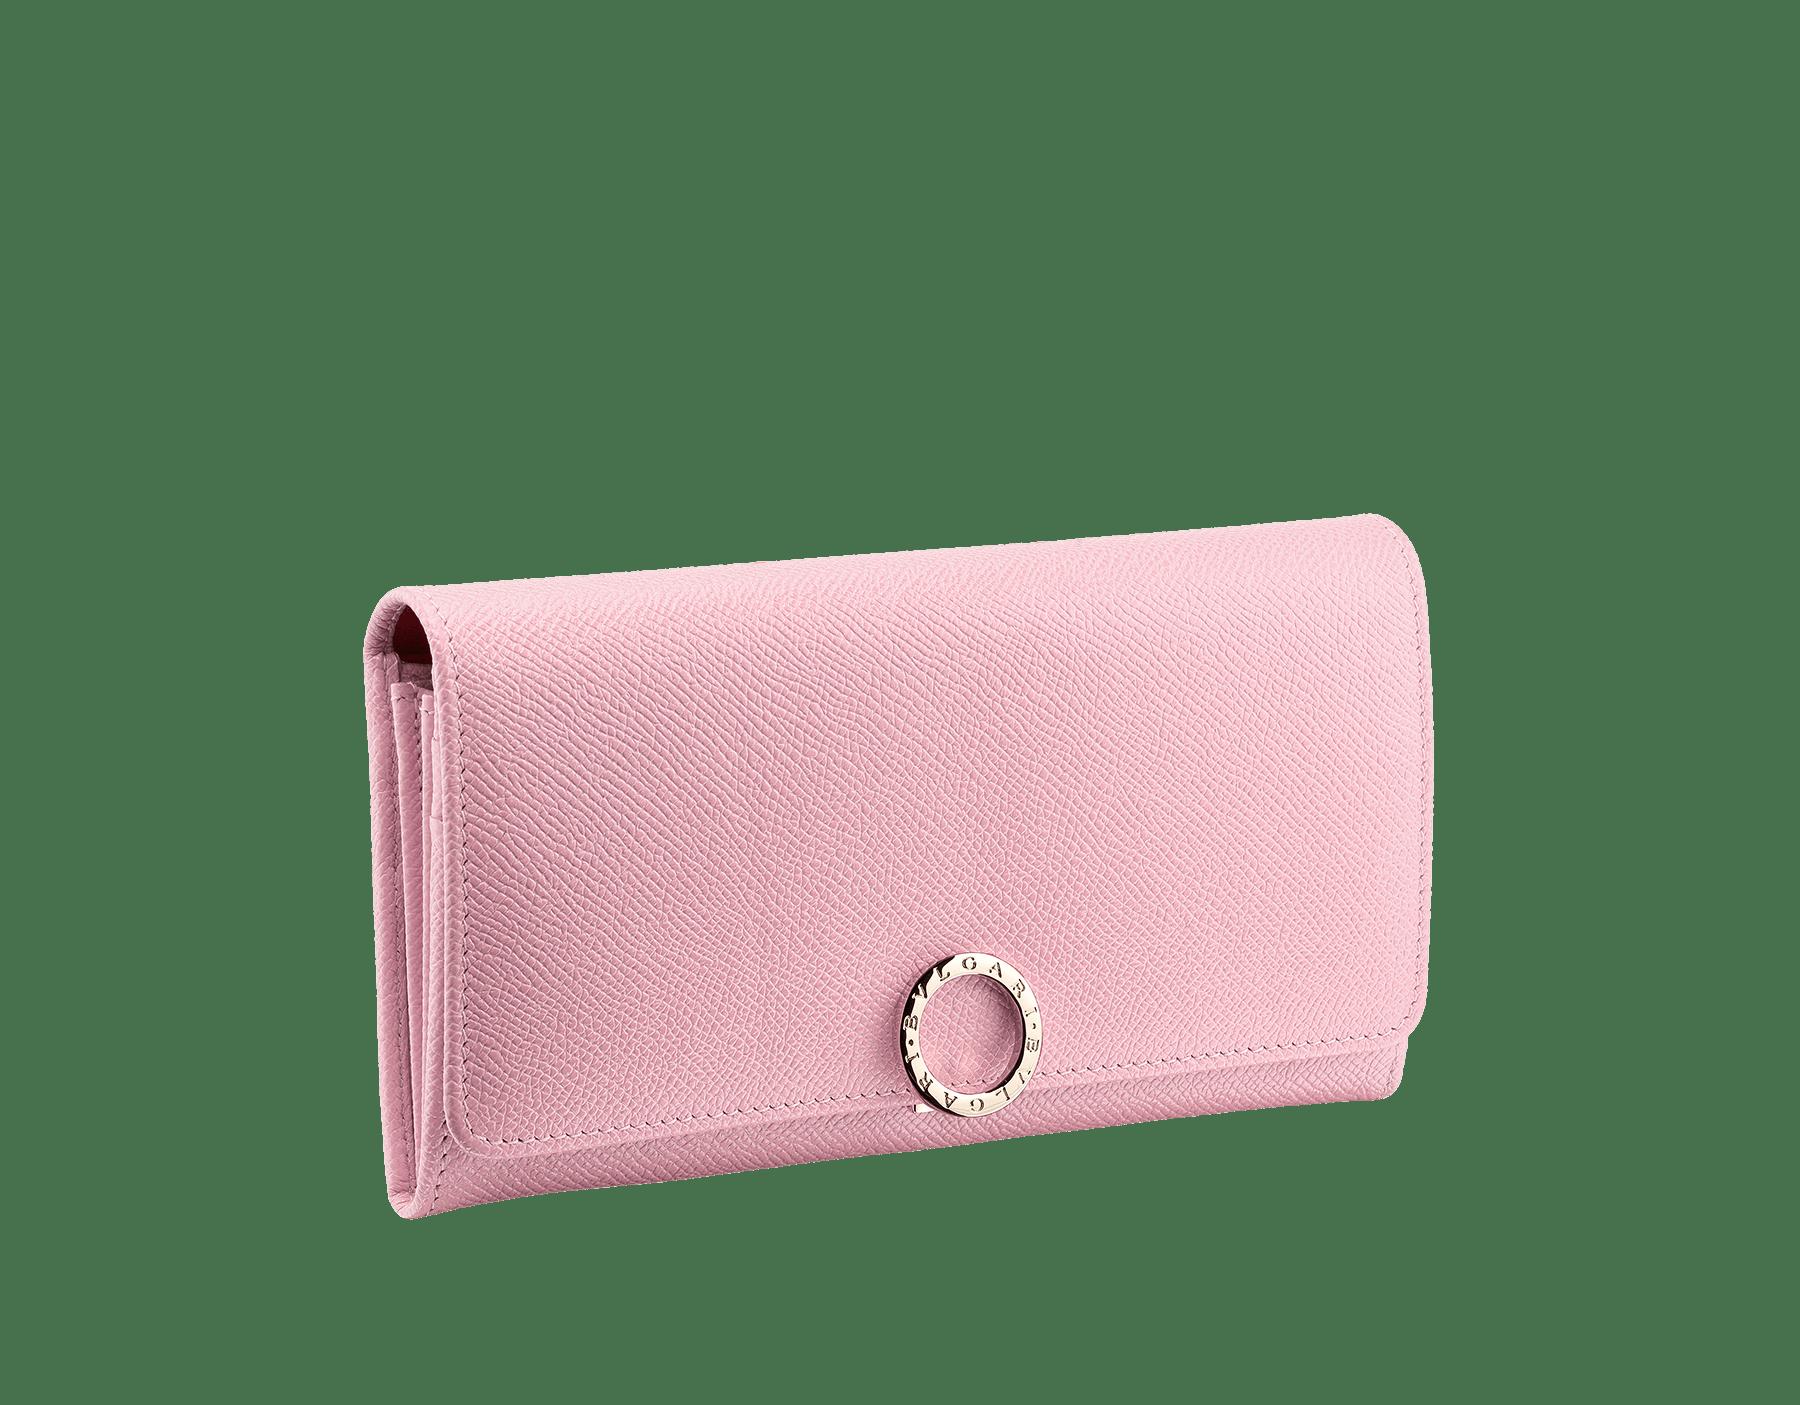 Wallet pochette in pink agate bright grain calf leather and jasper flame nappa. Brass light gold plated hardware and iconic Bulgari-Bulgari closure clip. 282869 image 1